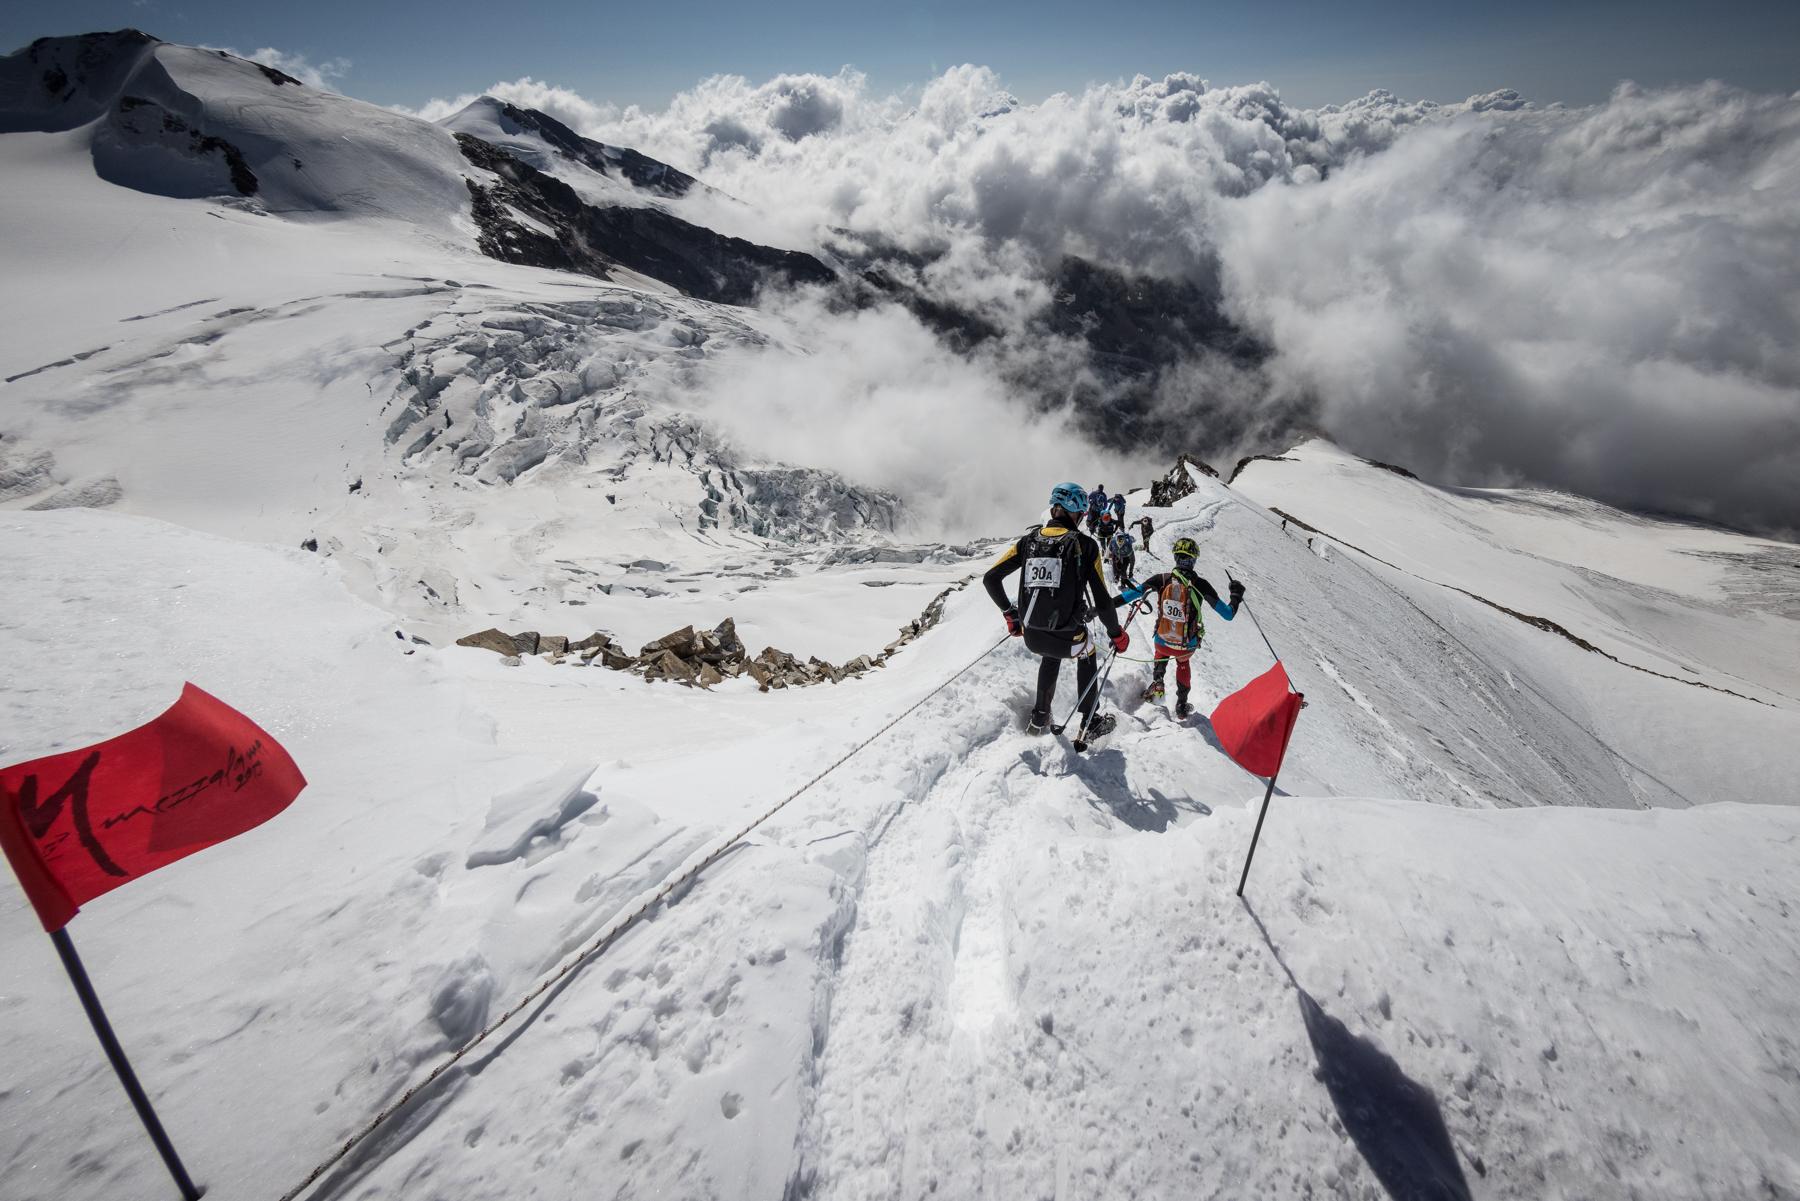 Skyclimb Mezzalama 2021 - Castore - foto credits Maurizio Torri